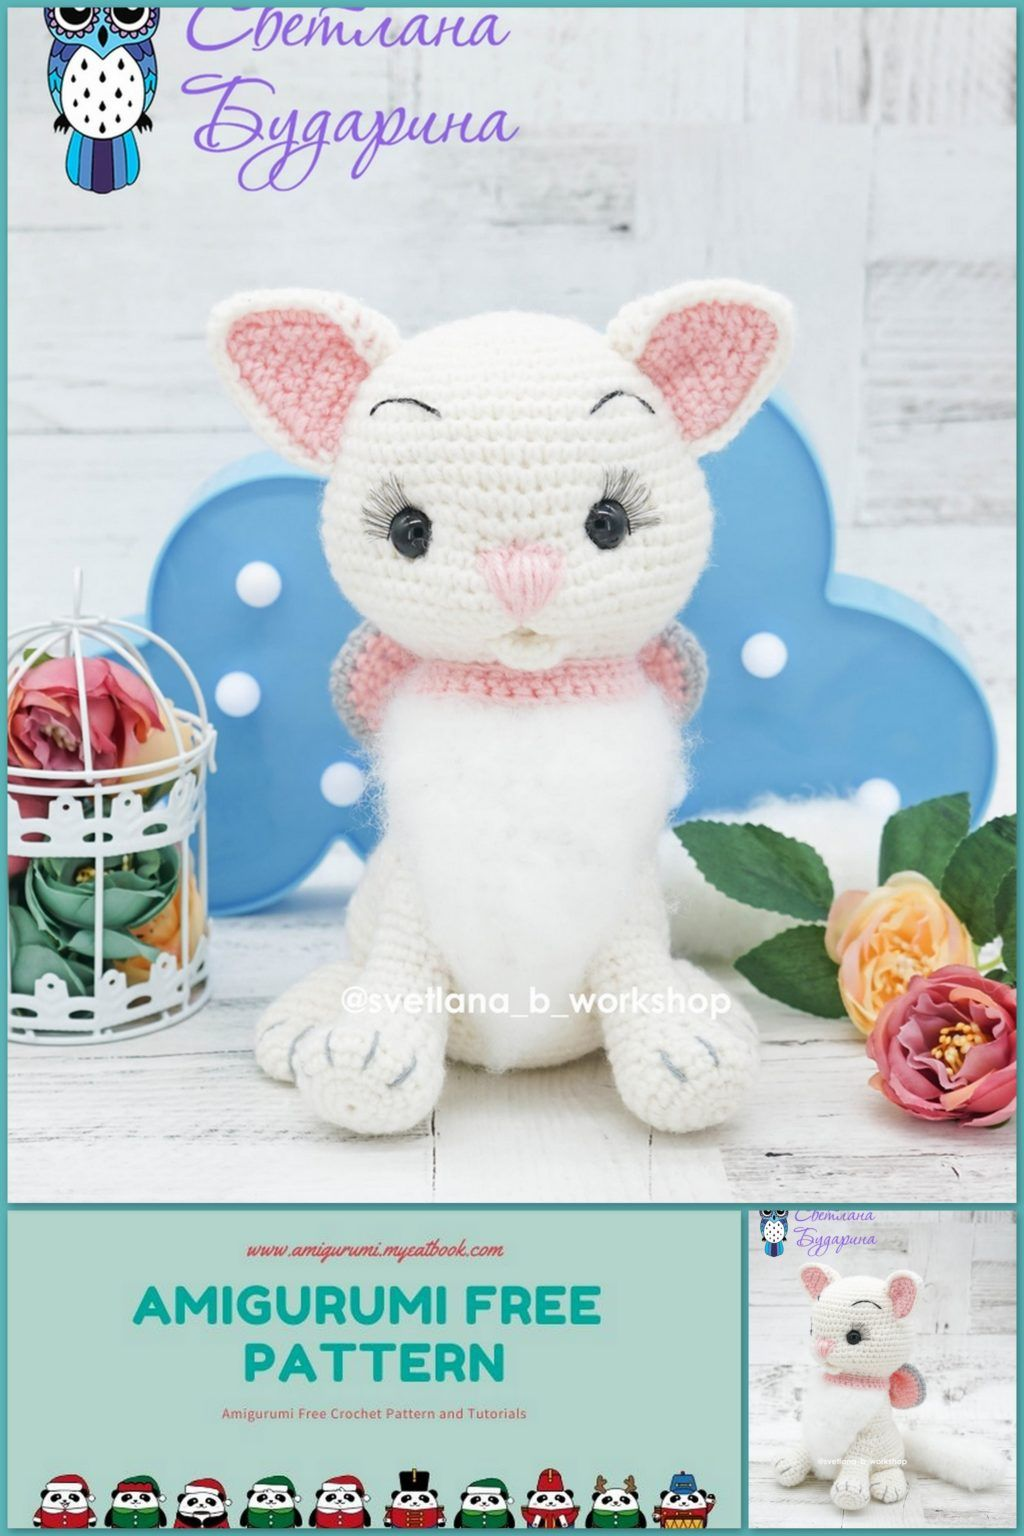 Cute Kitty Cat amigurumi pattern by DIY Fluffies | Gatos de crochê ... | 1536x1024